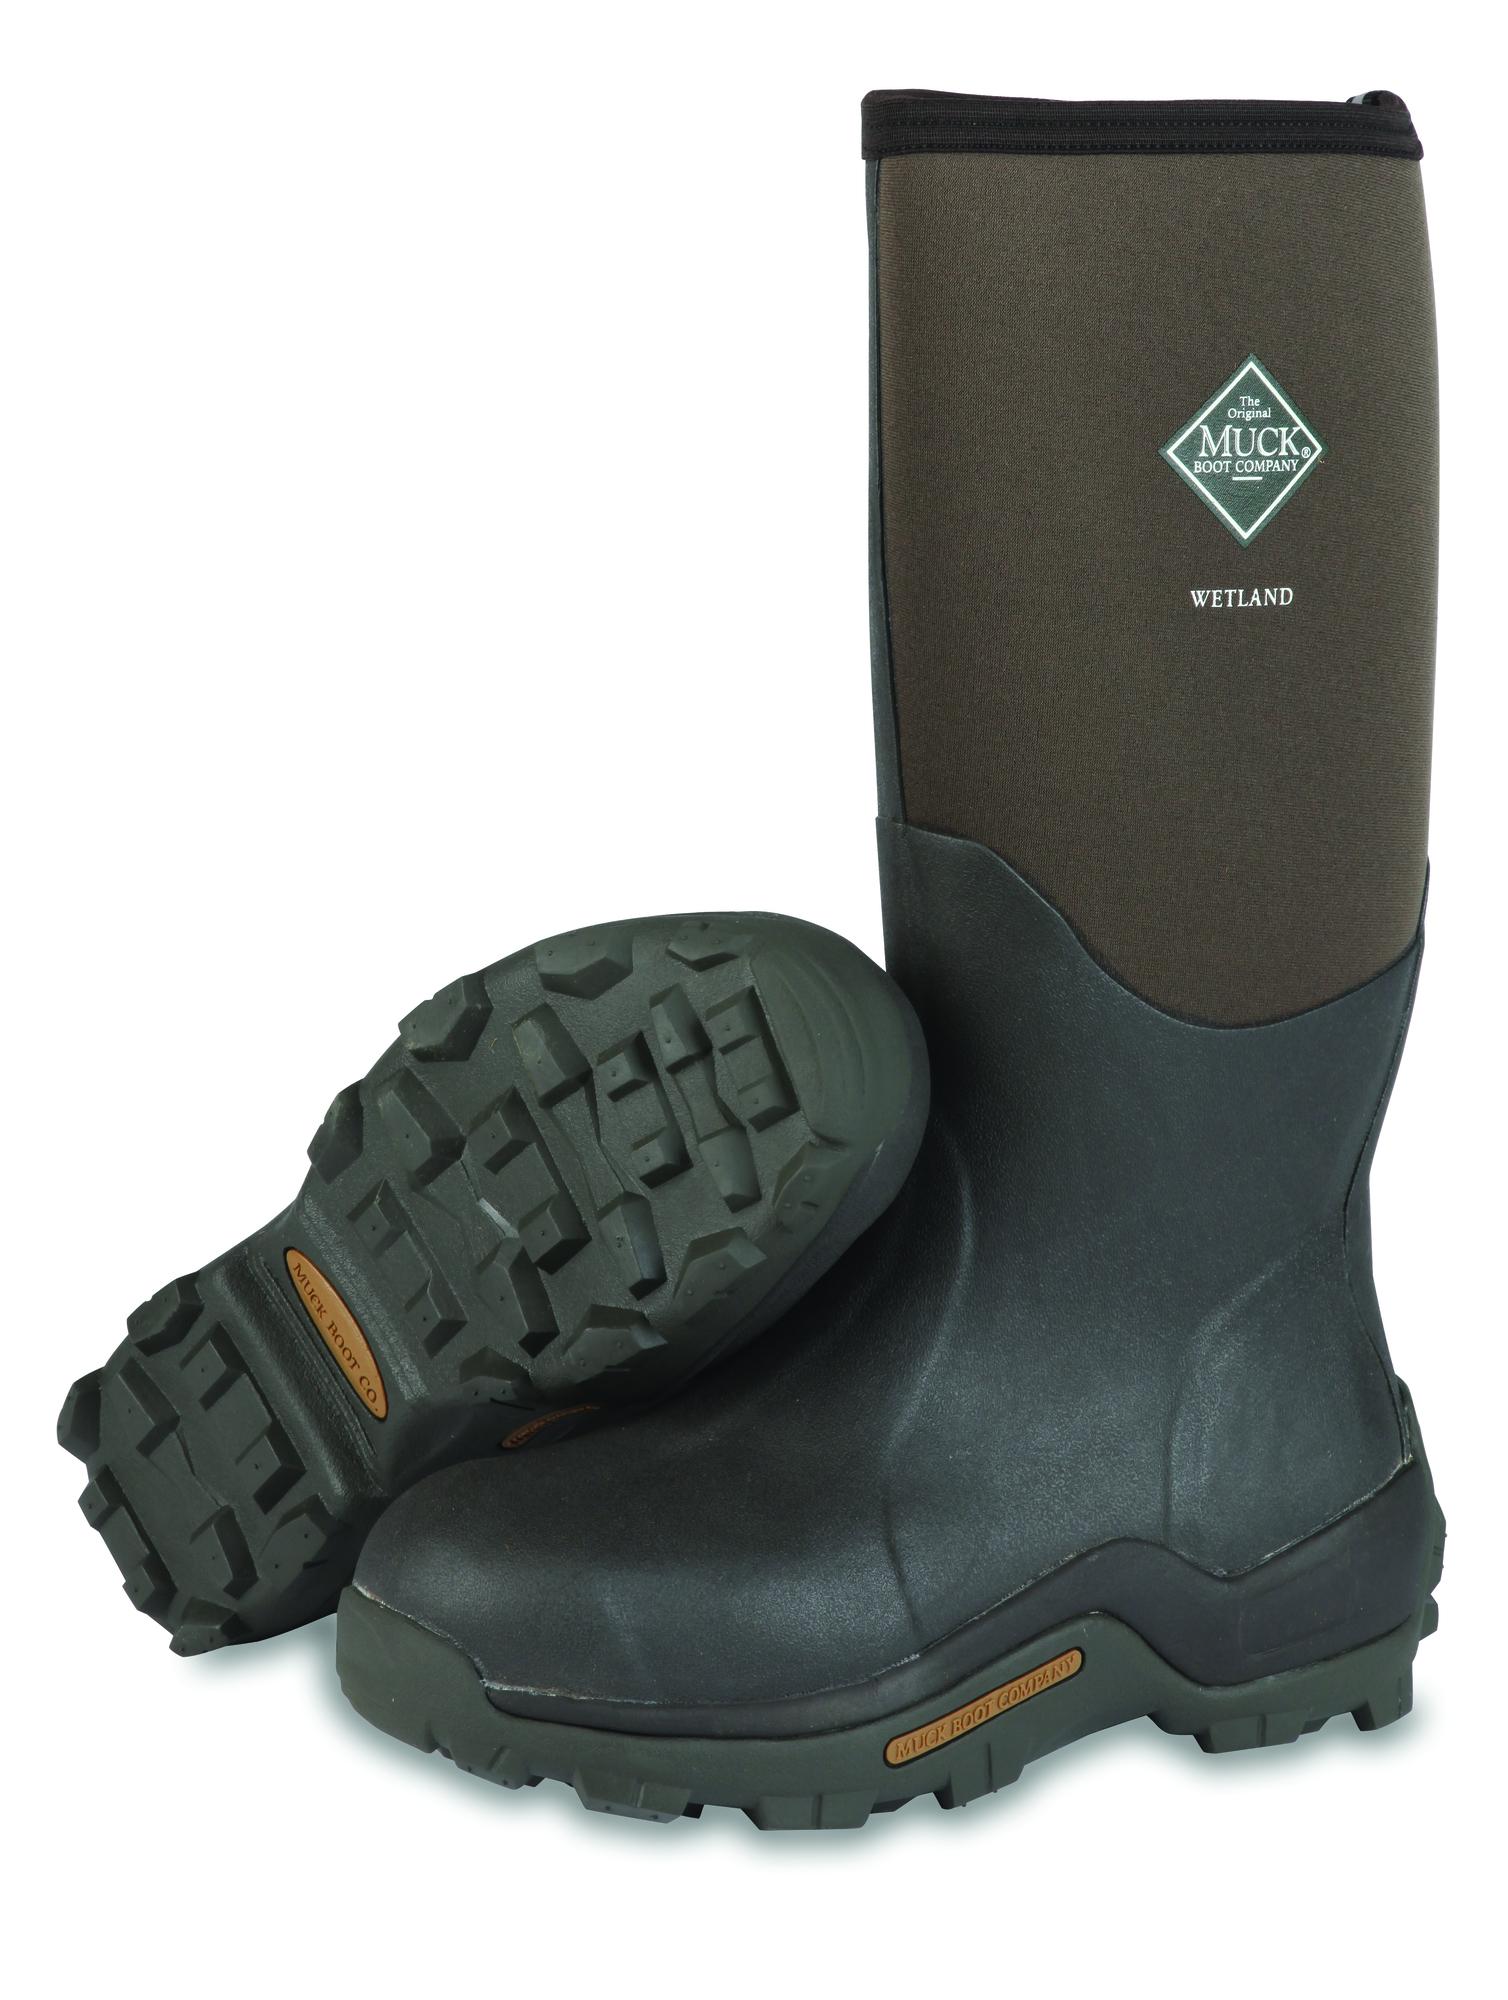 Muck Wetland Boot  <br>  Tan 11